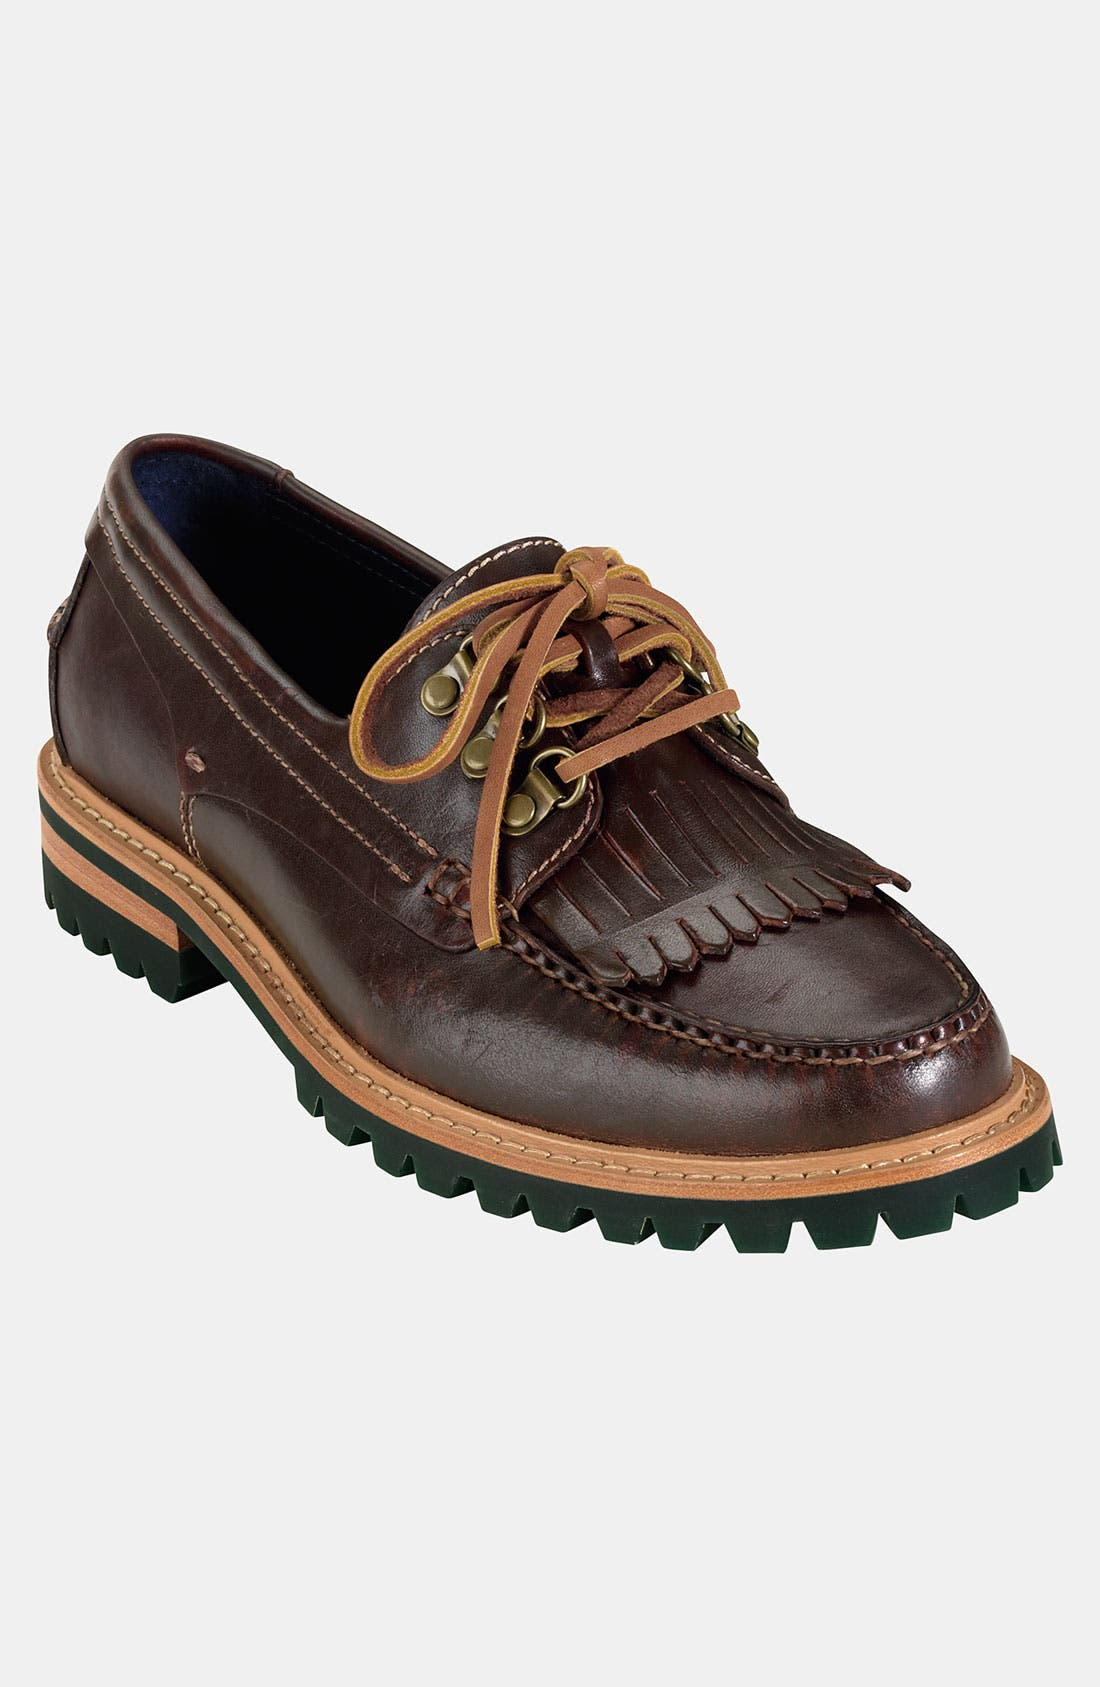 Alternate Image 1 Selected - Cole Haan 'Monroe' Kiltie Boat Shoe   (Men)